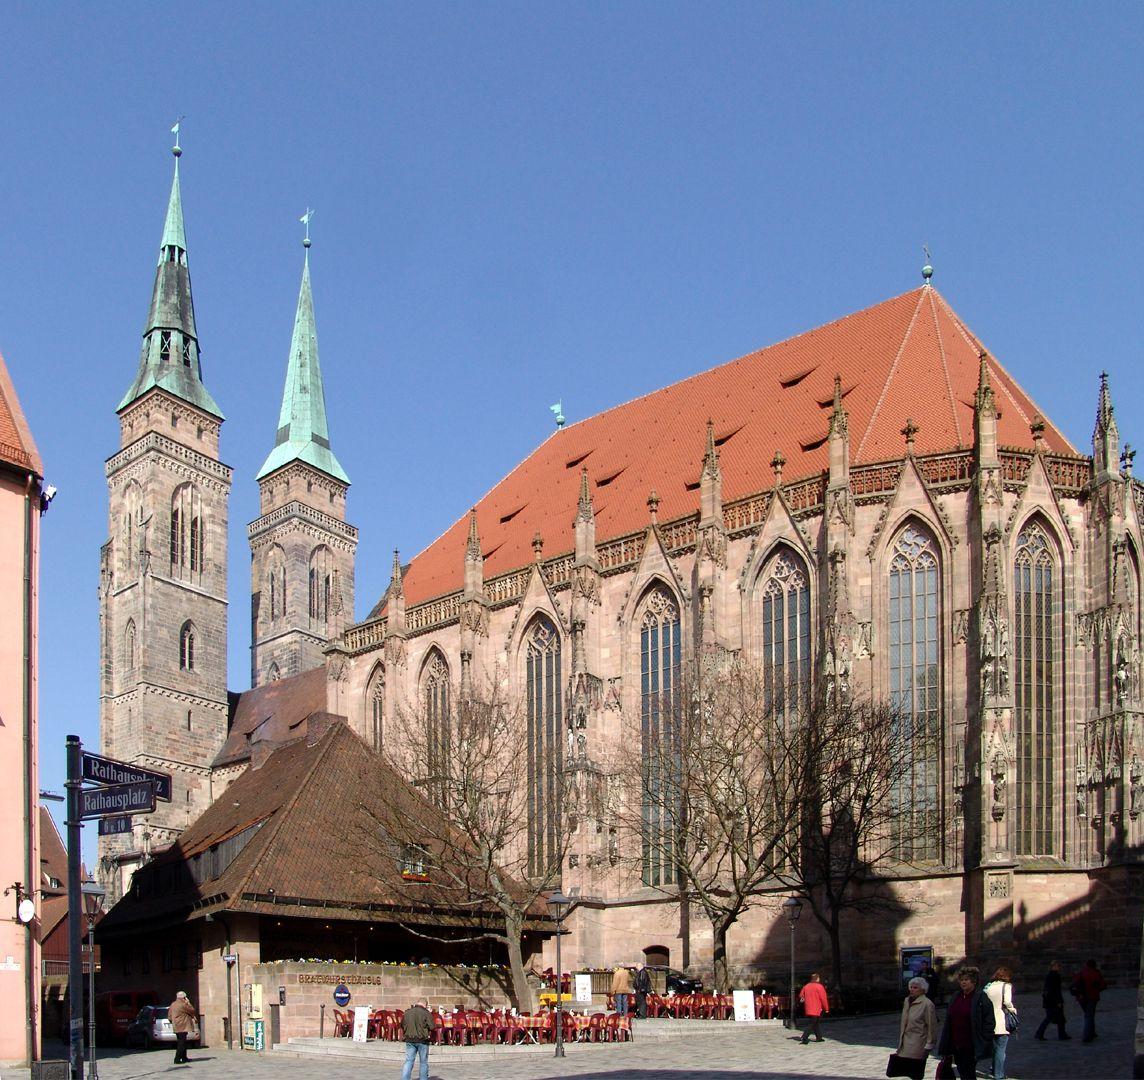 Bratwursthäusle View at the foot of St. Sebaldus Church